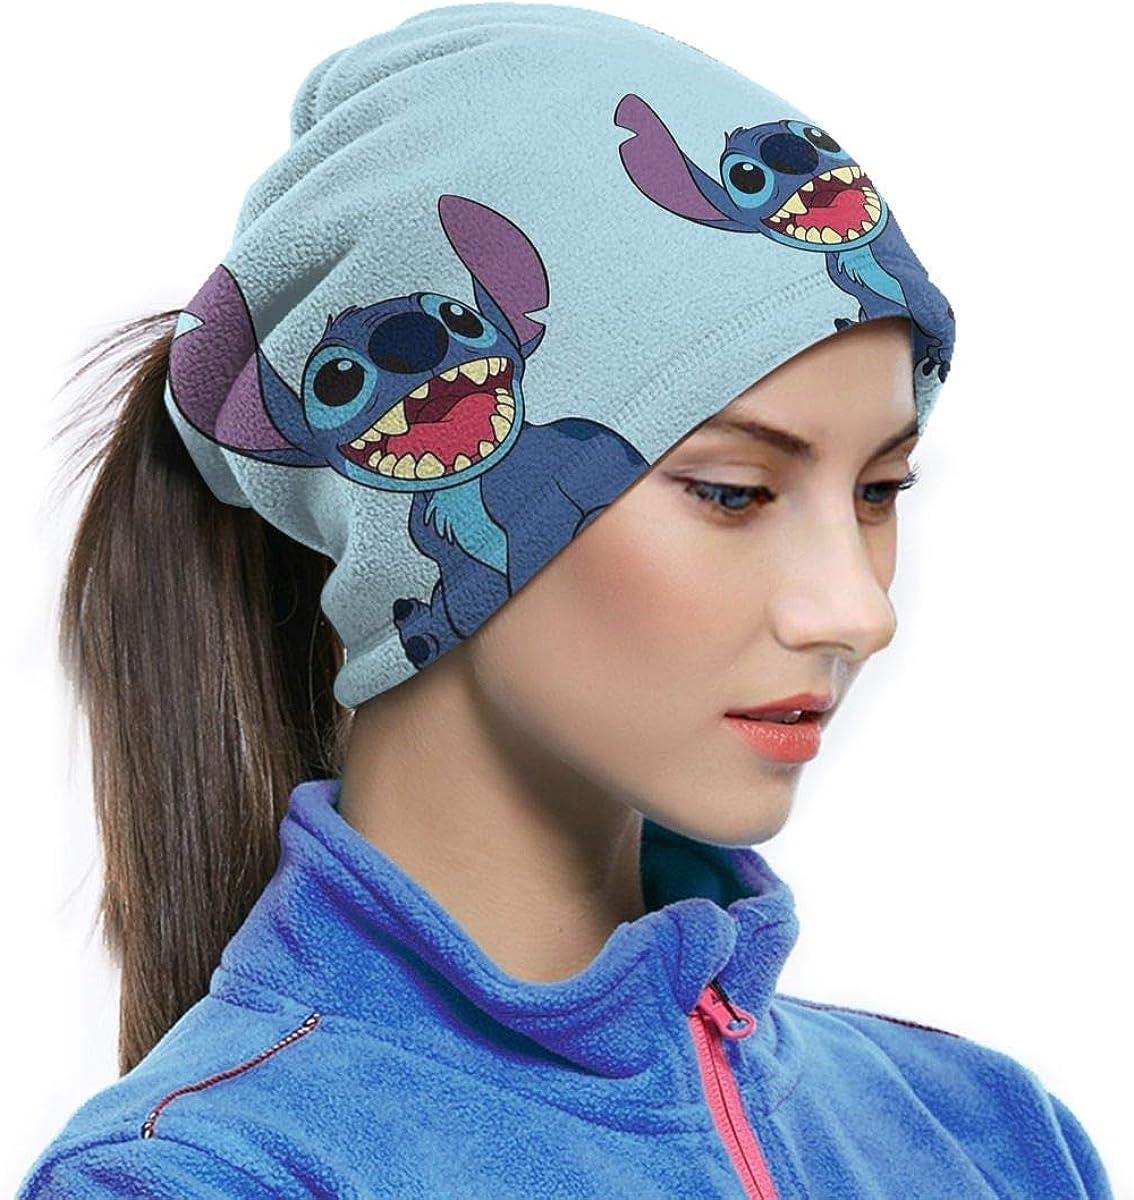 Lsjuee cuello polaina calentador a prueba de viento Stitch Love multifuncional cara Bandanas diadema diadema